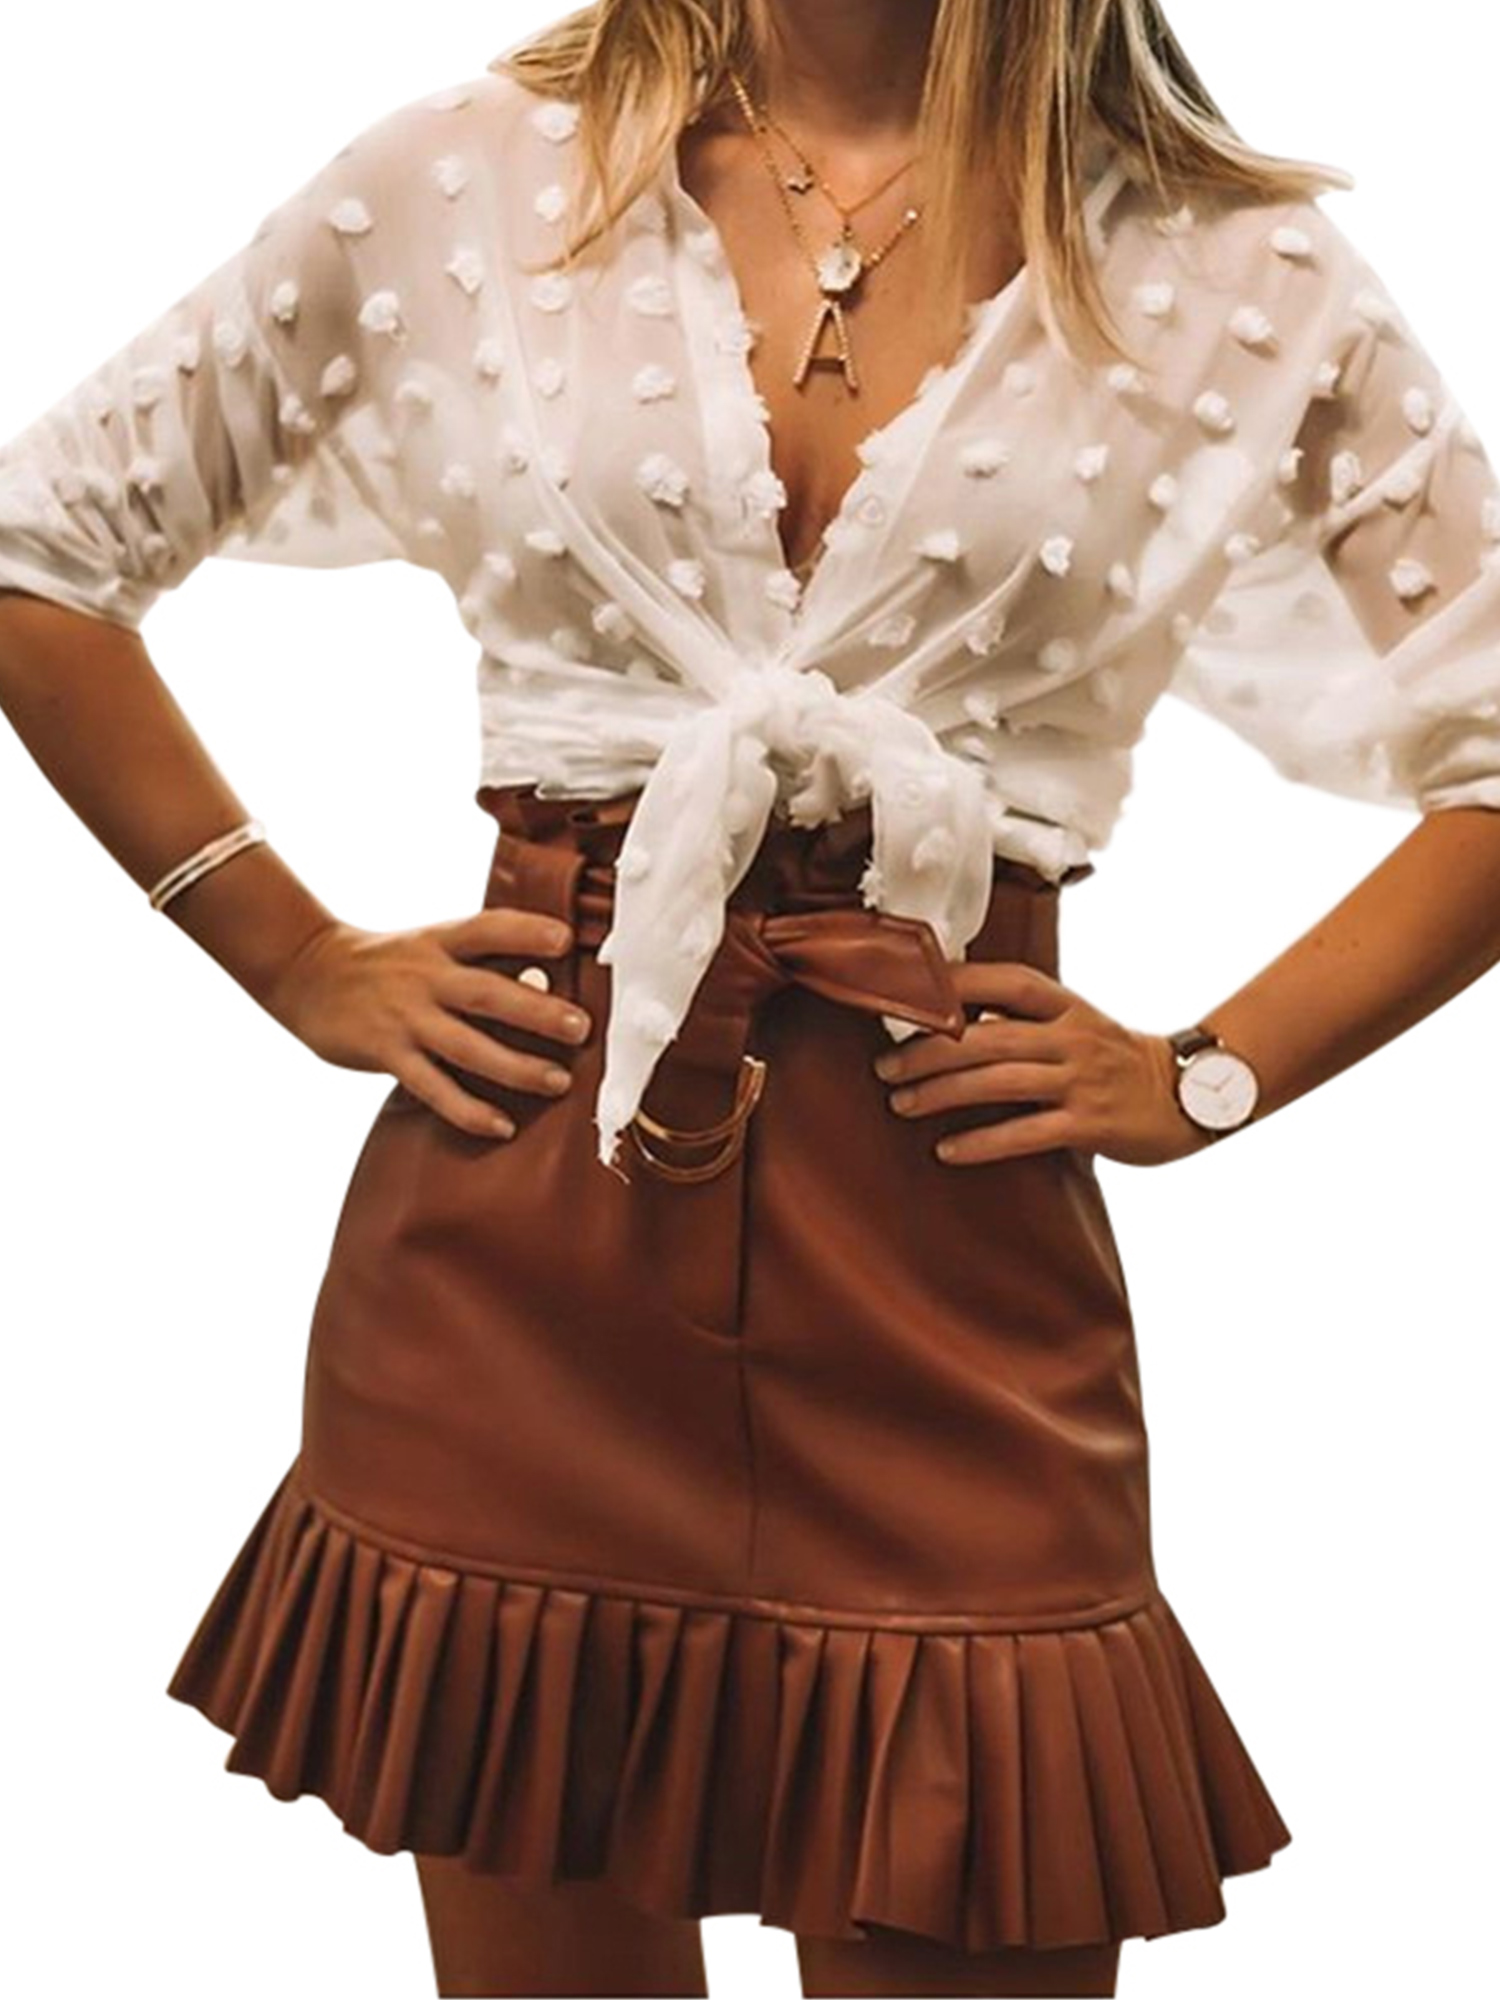 Ladies Ruffled Frill Mini Skirt Womens High Waisted Party Skort  Shorts New